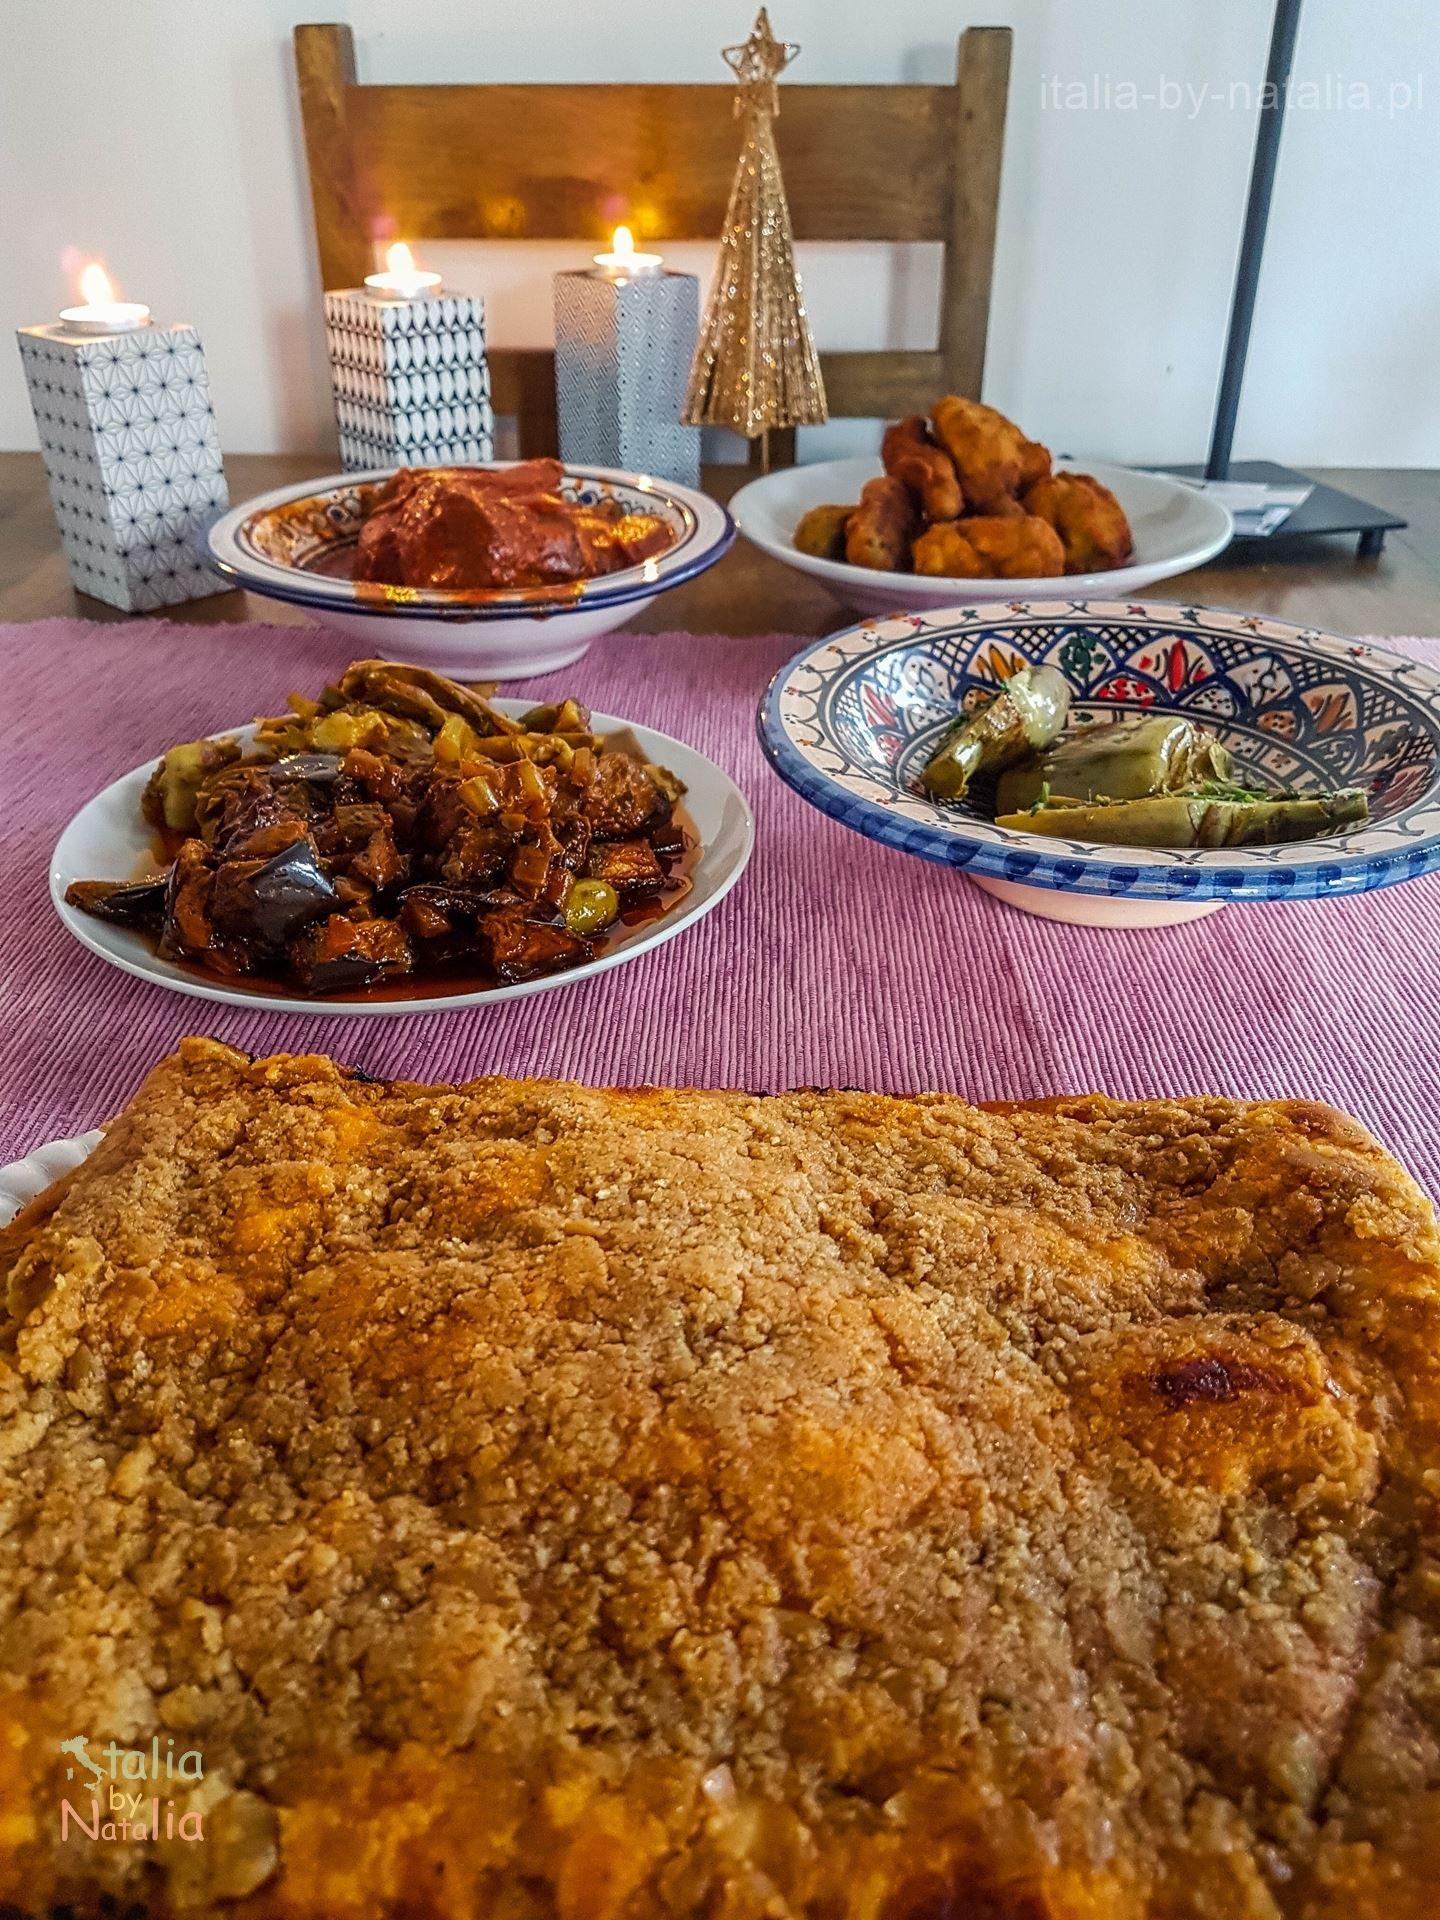 Palermo Sycylia gastronomia Antonio Savoca